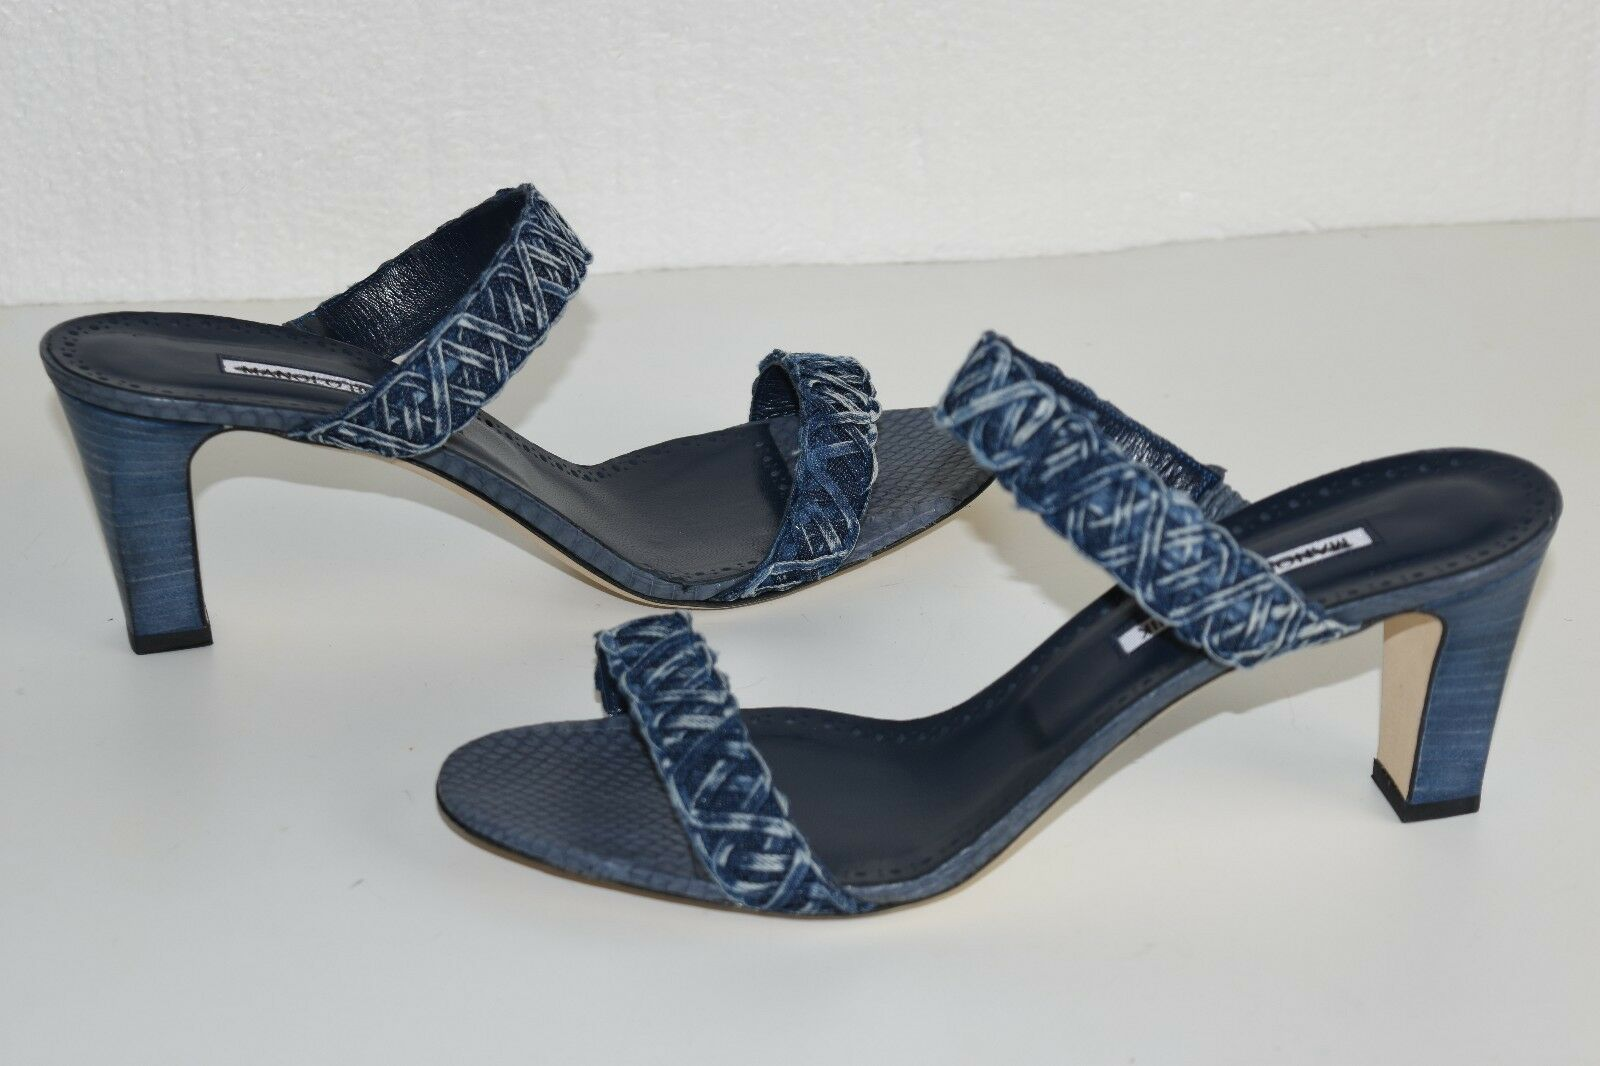 785 NEW Manolo Manolo Manolo Blahnik GERAS Denim SNAKE Slide Sandal Navy Block Heels shoes 41 15cd45